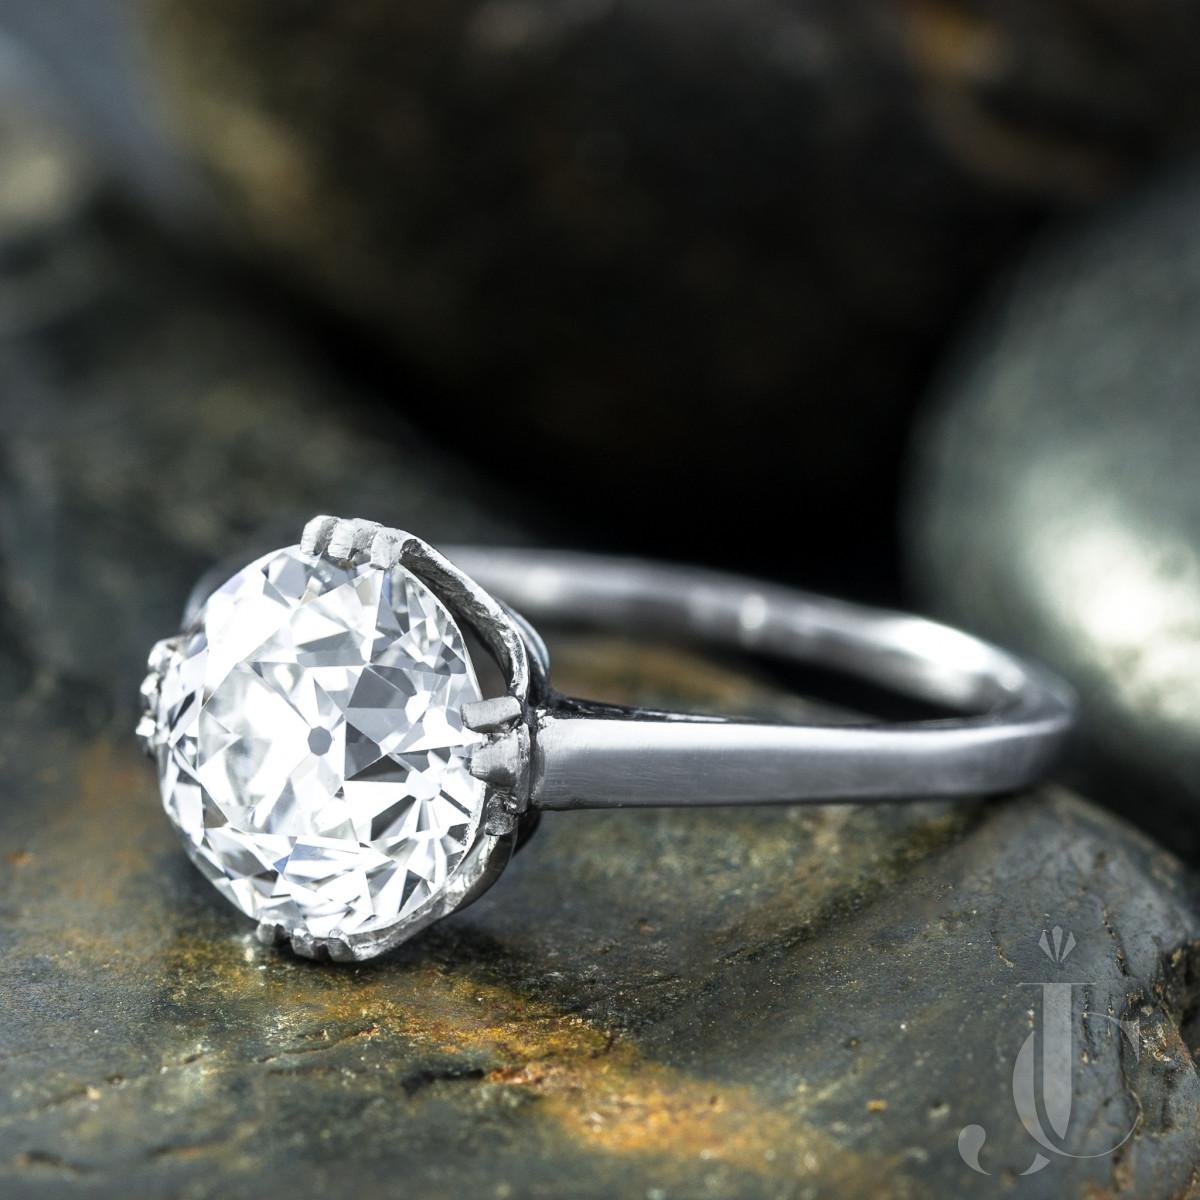 Antique Diamond Engagement Ring, 2.64 Ct GIA G SI2 OEC